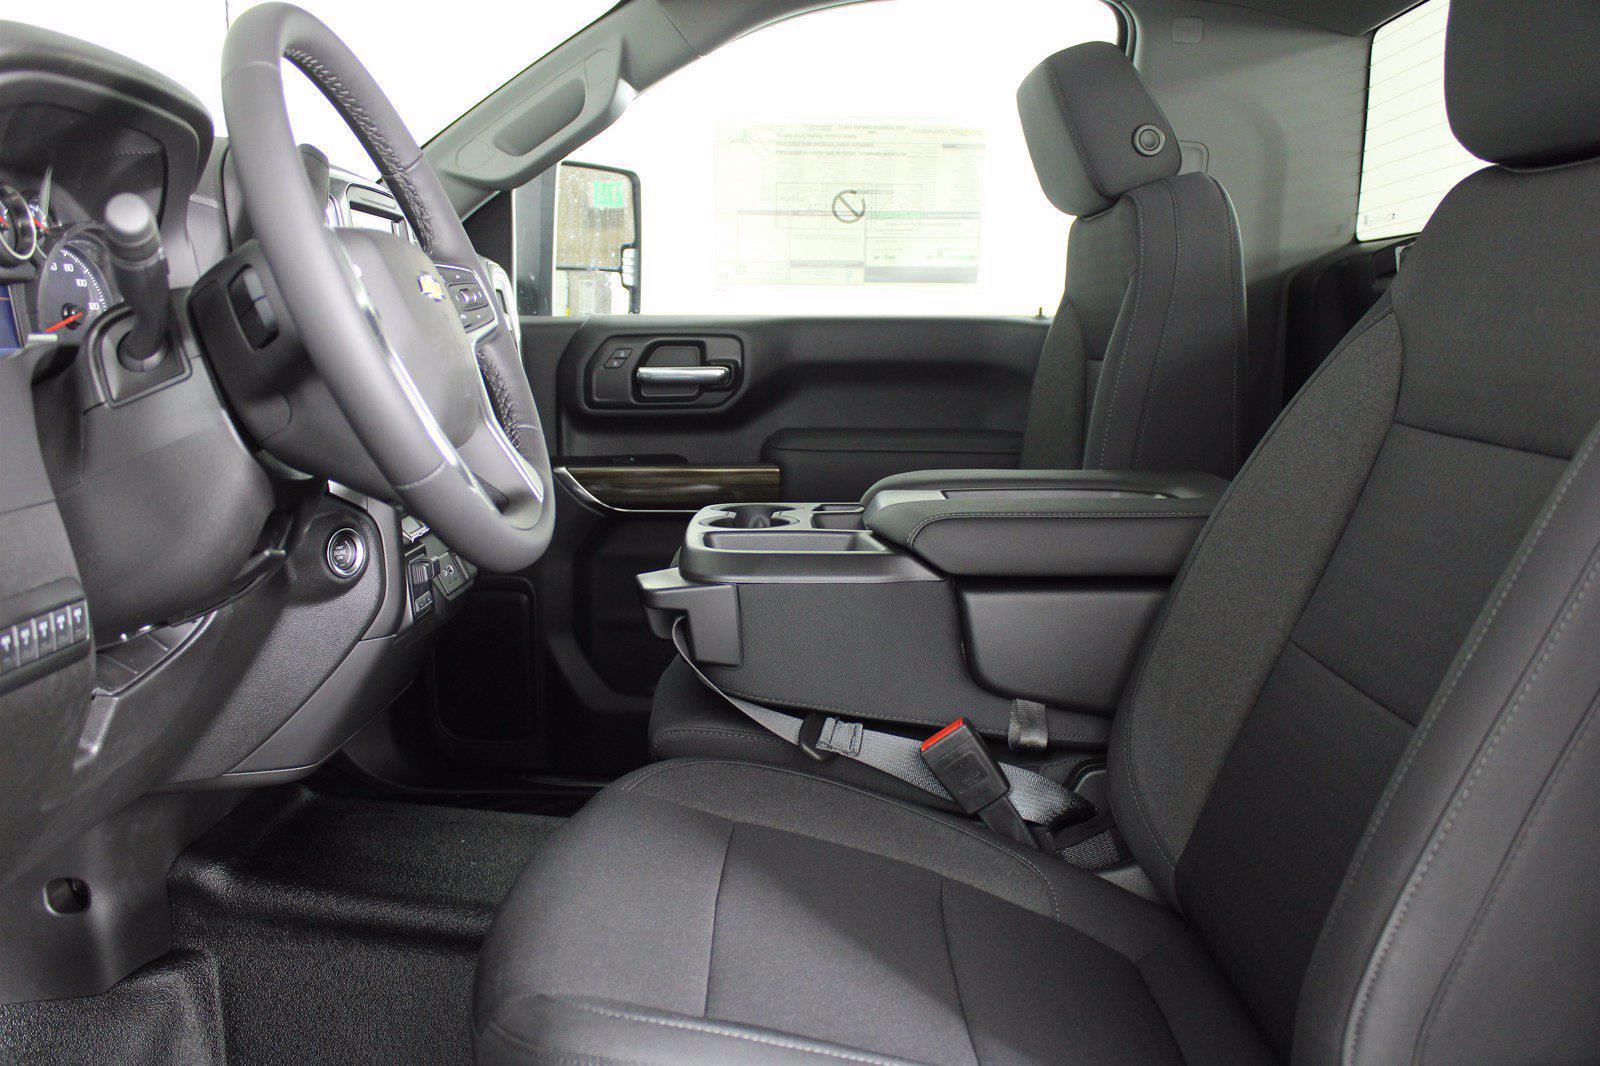 2022 Silverado 2500 Regular Cab 4x4,  Pickup #D120035 - photo 15